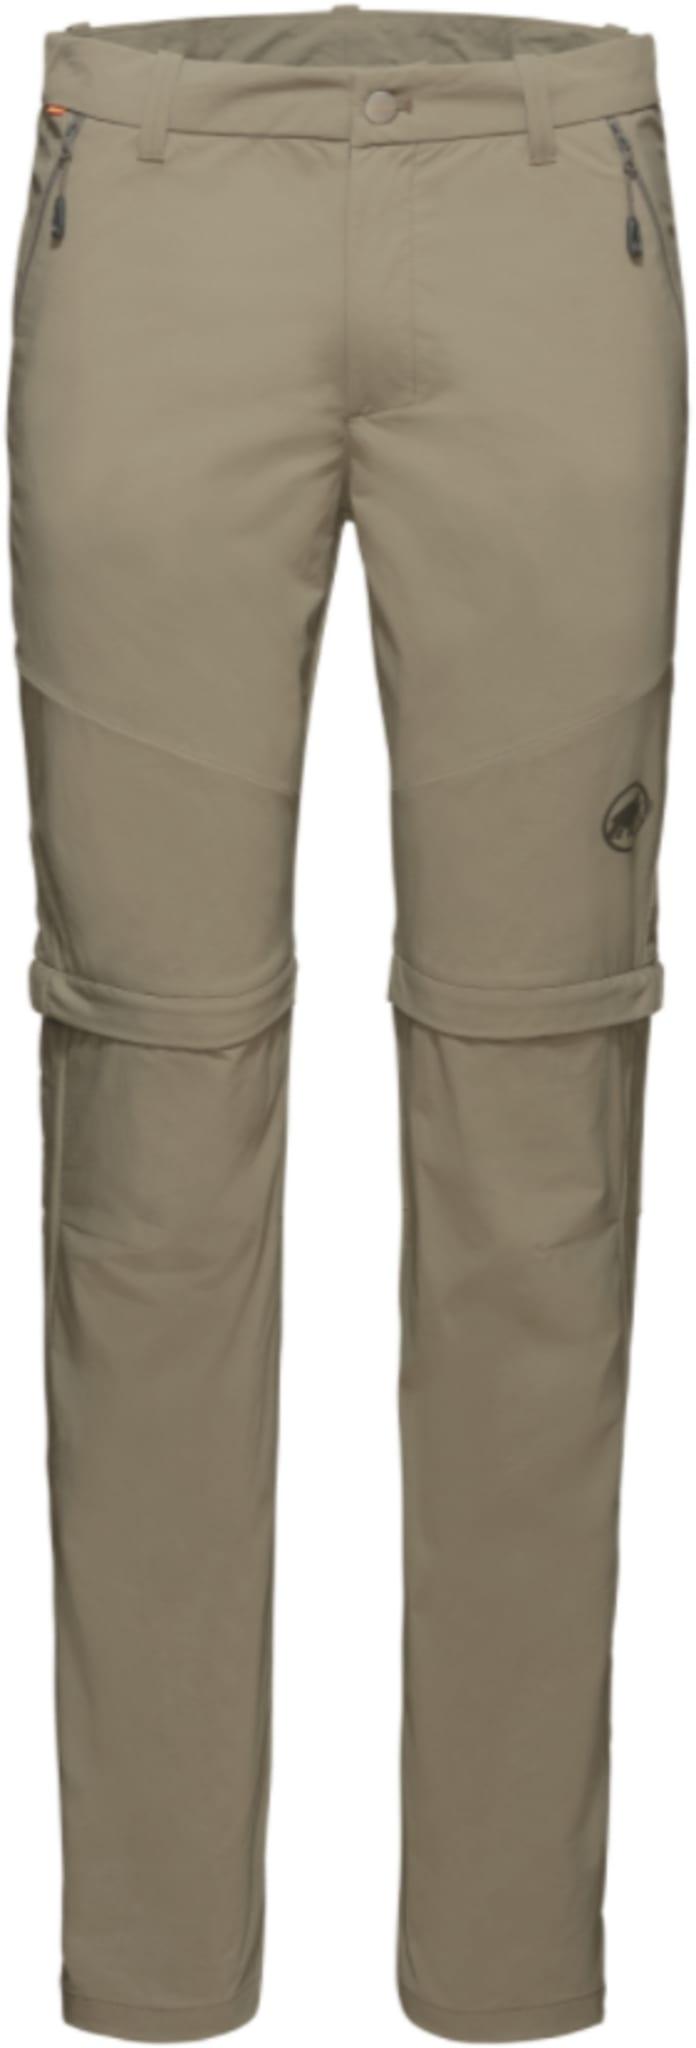 Hiking Zip Off Pants Ms